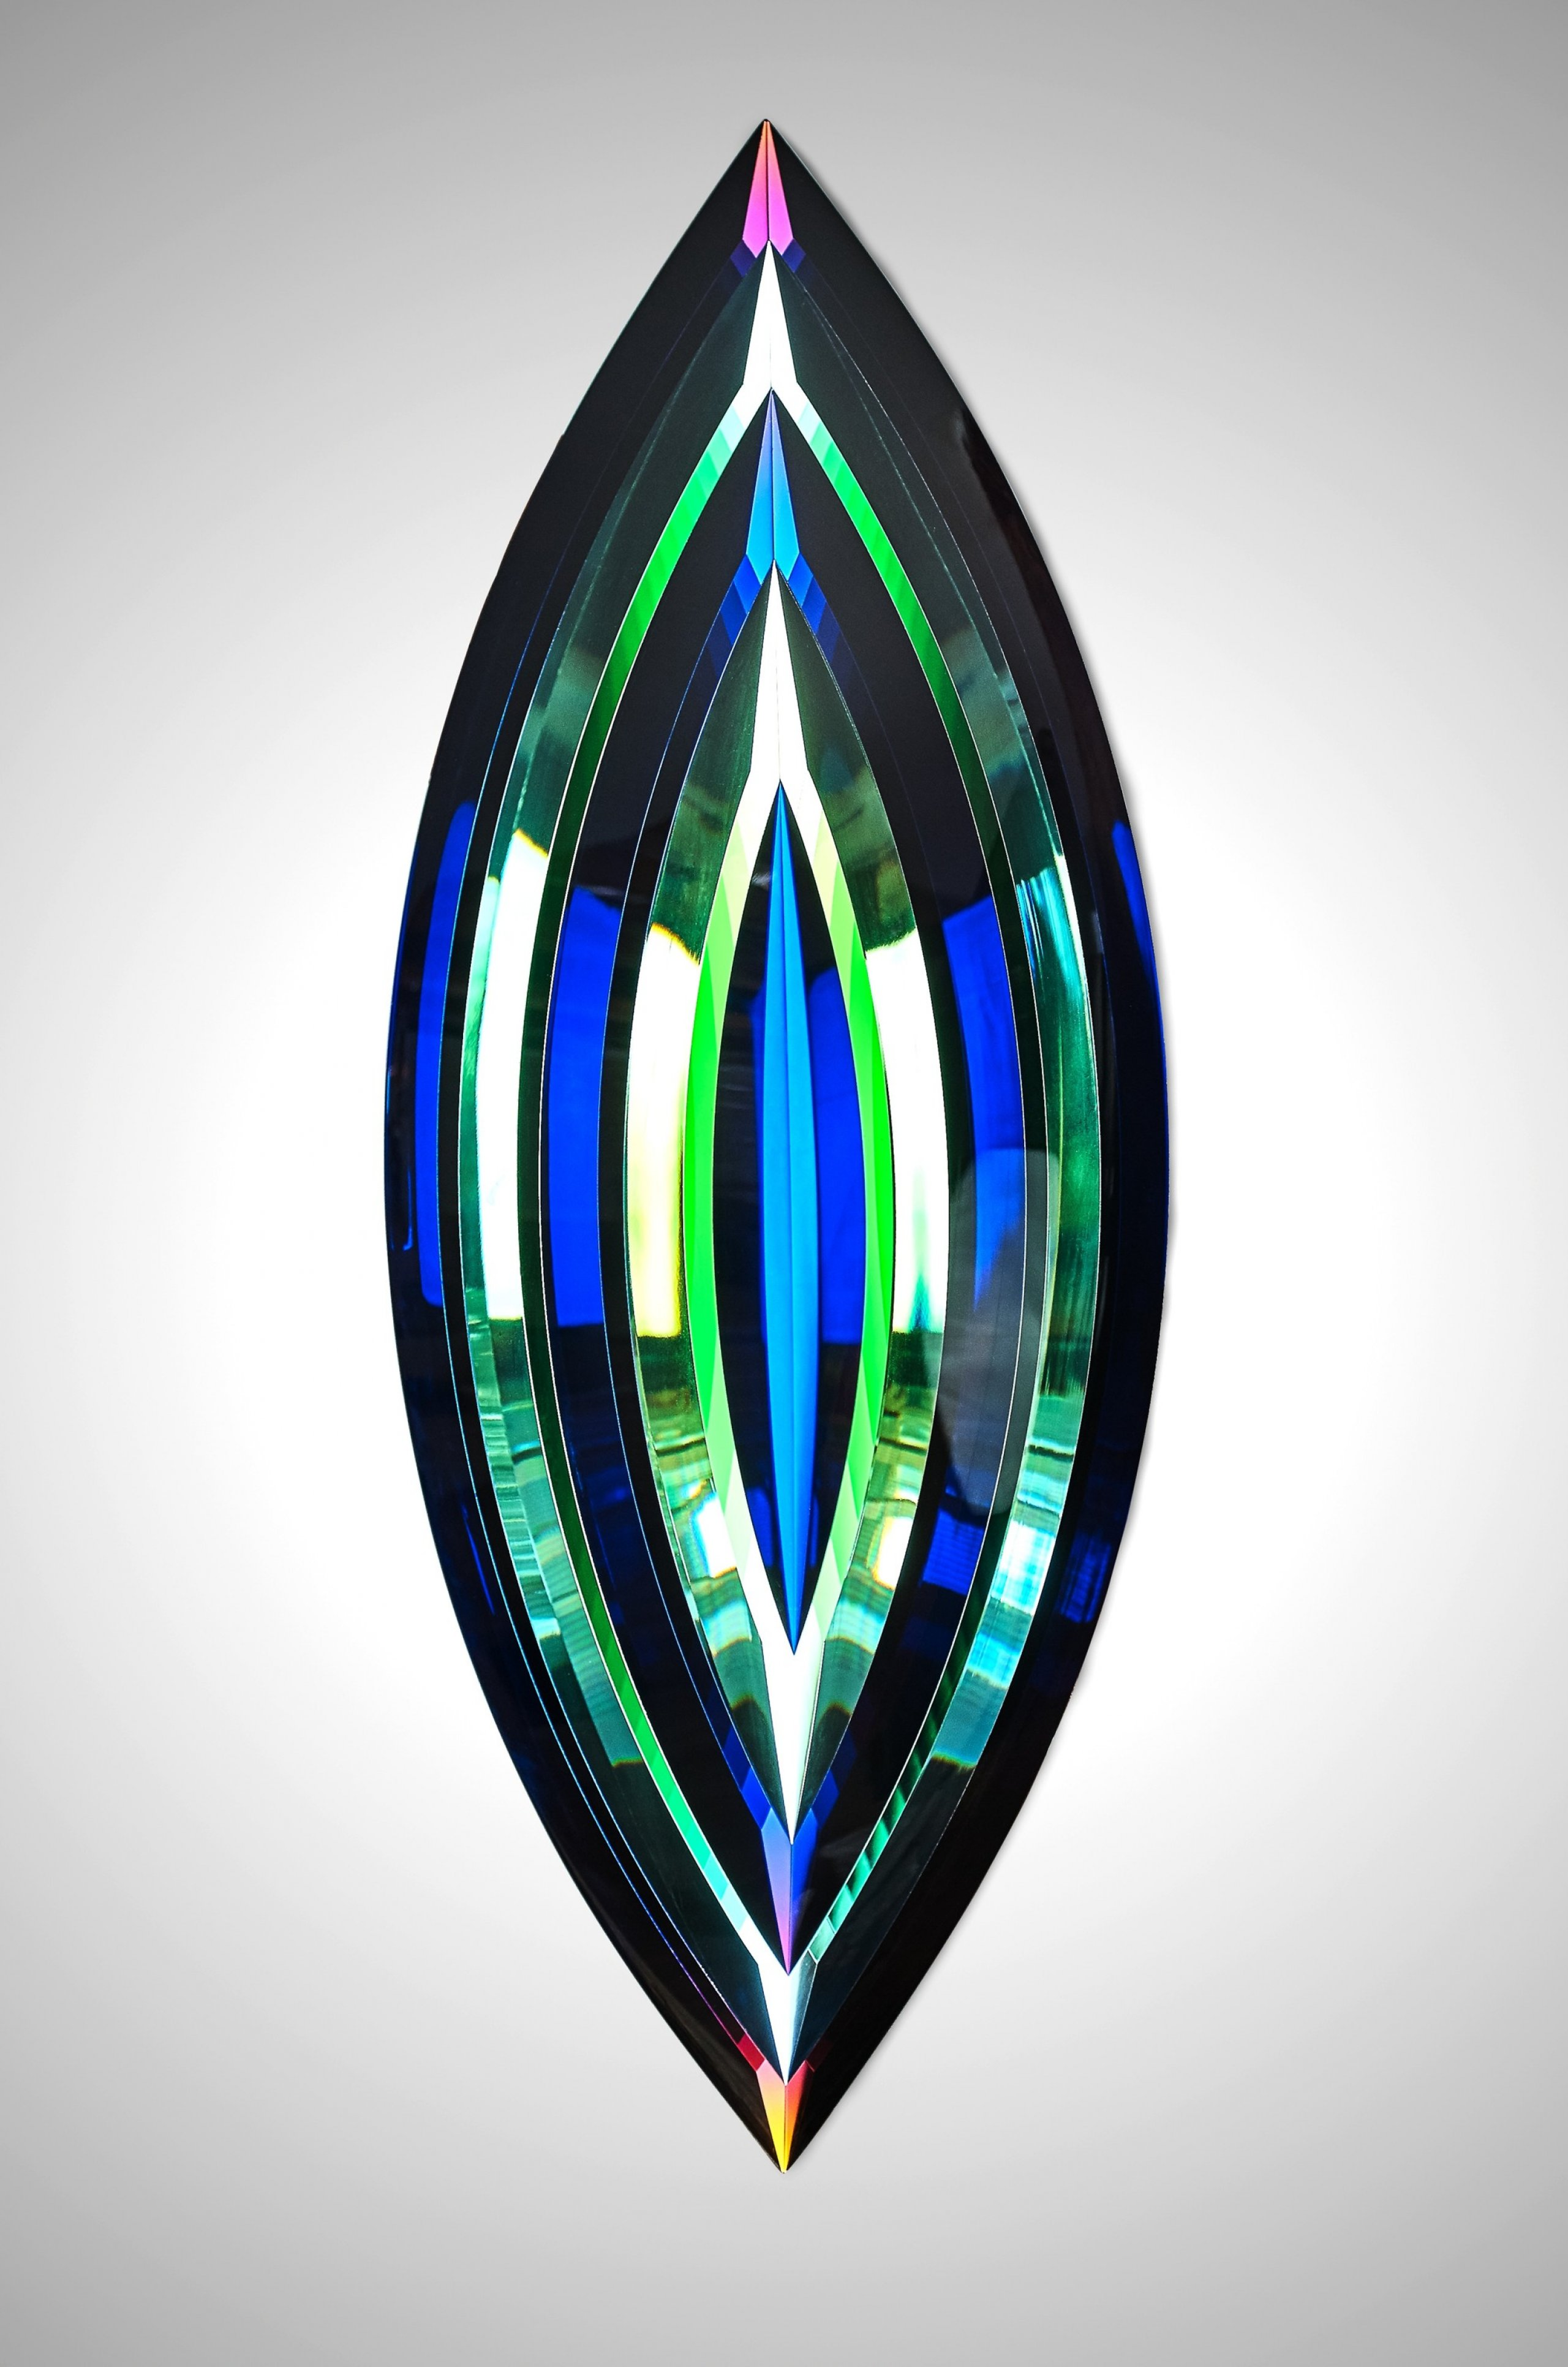 The Best of Glass Art: Jaroslav Prošek glass sculpture The Best of Glass Sculpture Art: Jaroslav Prošek 27 eye 6d757